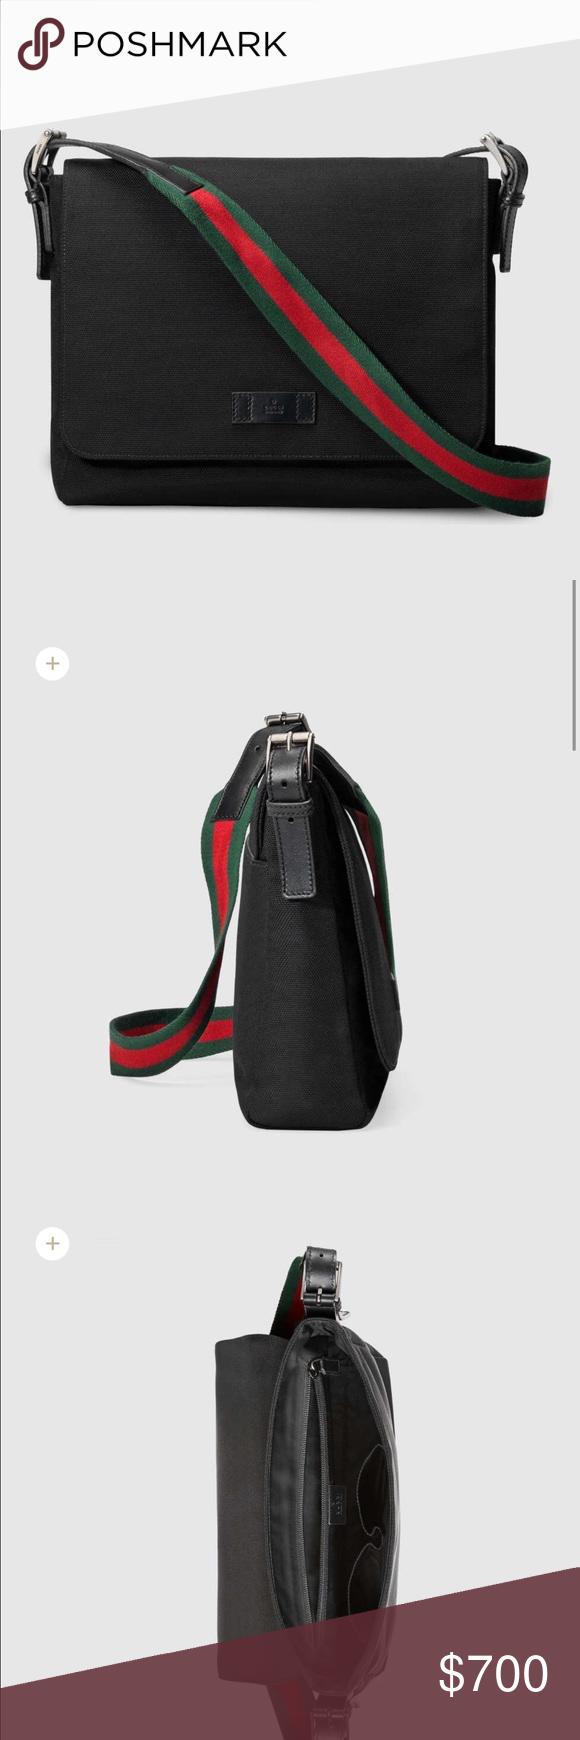 0132b8d12d8 Auth Gucci crossbody black bag. Nwt Gucci s techno canvas messenger bag. On  the Gucci